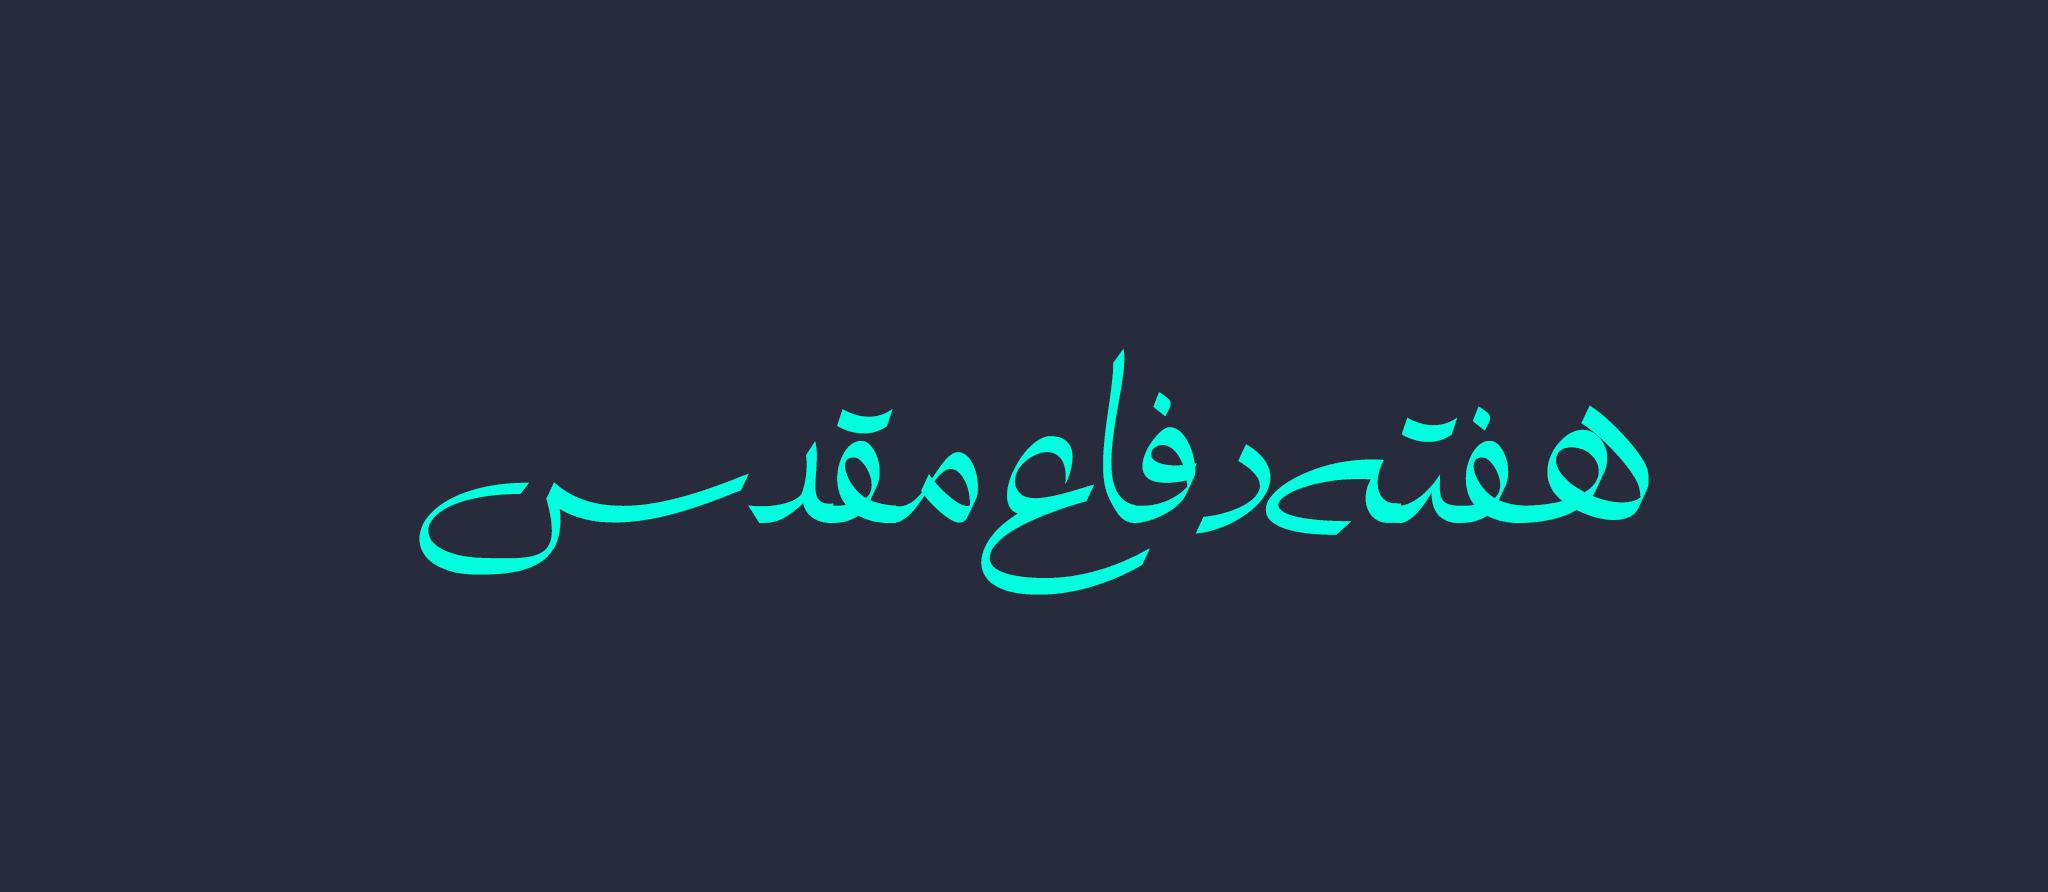 فونت فارسی رایگان پایتخت